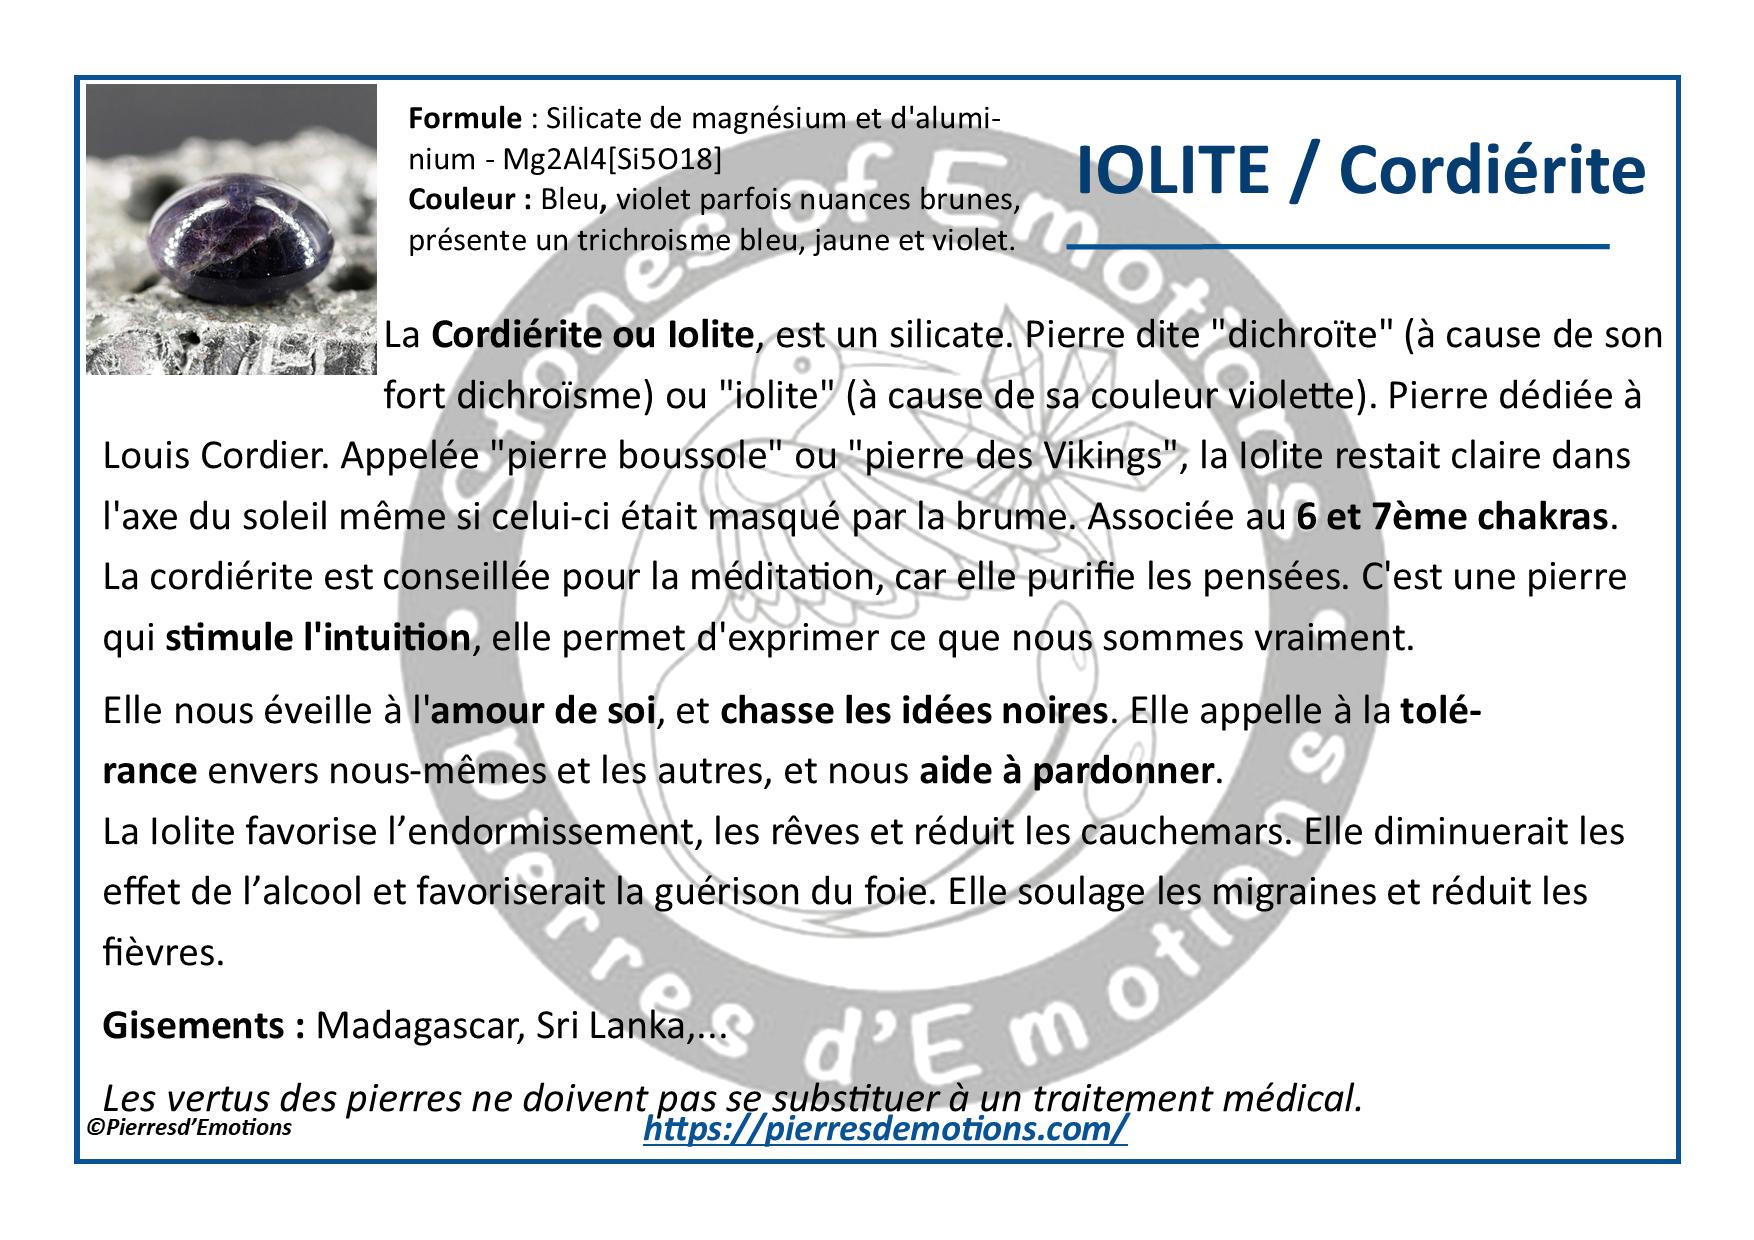 Iolite-Cordierite